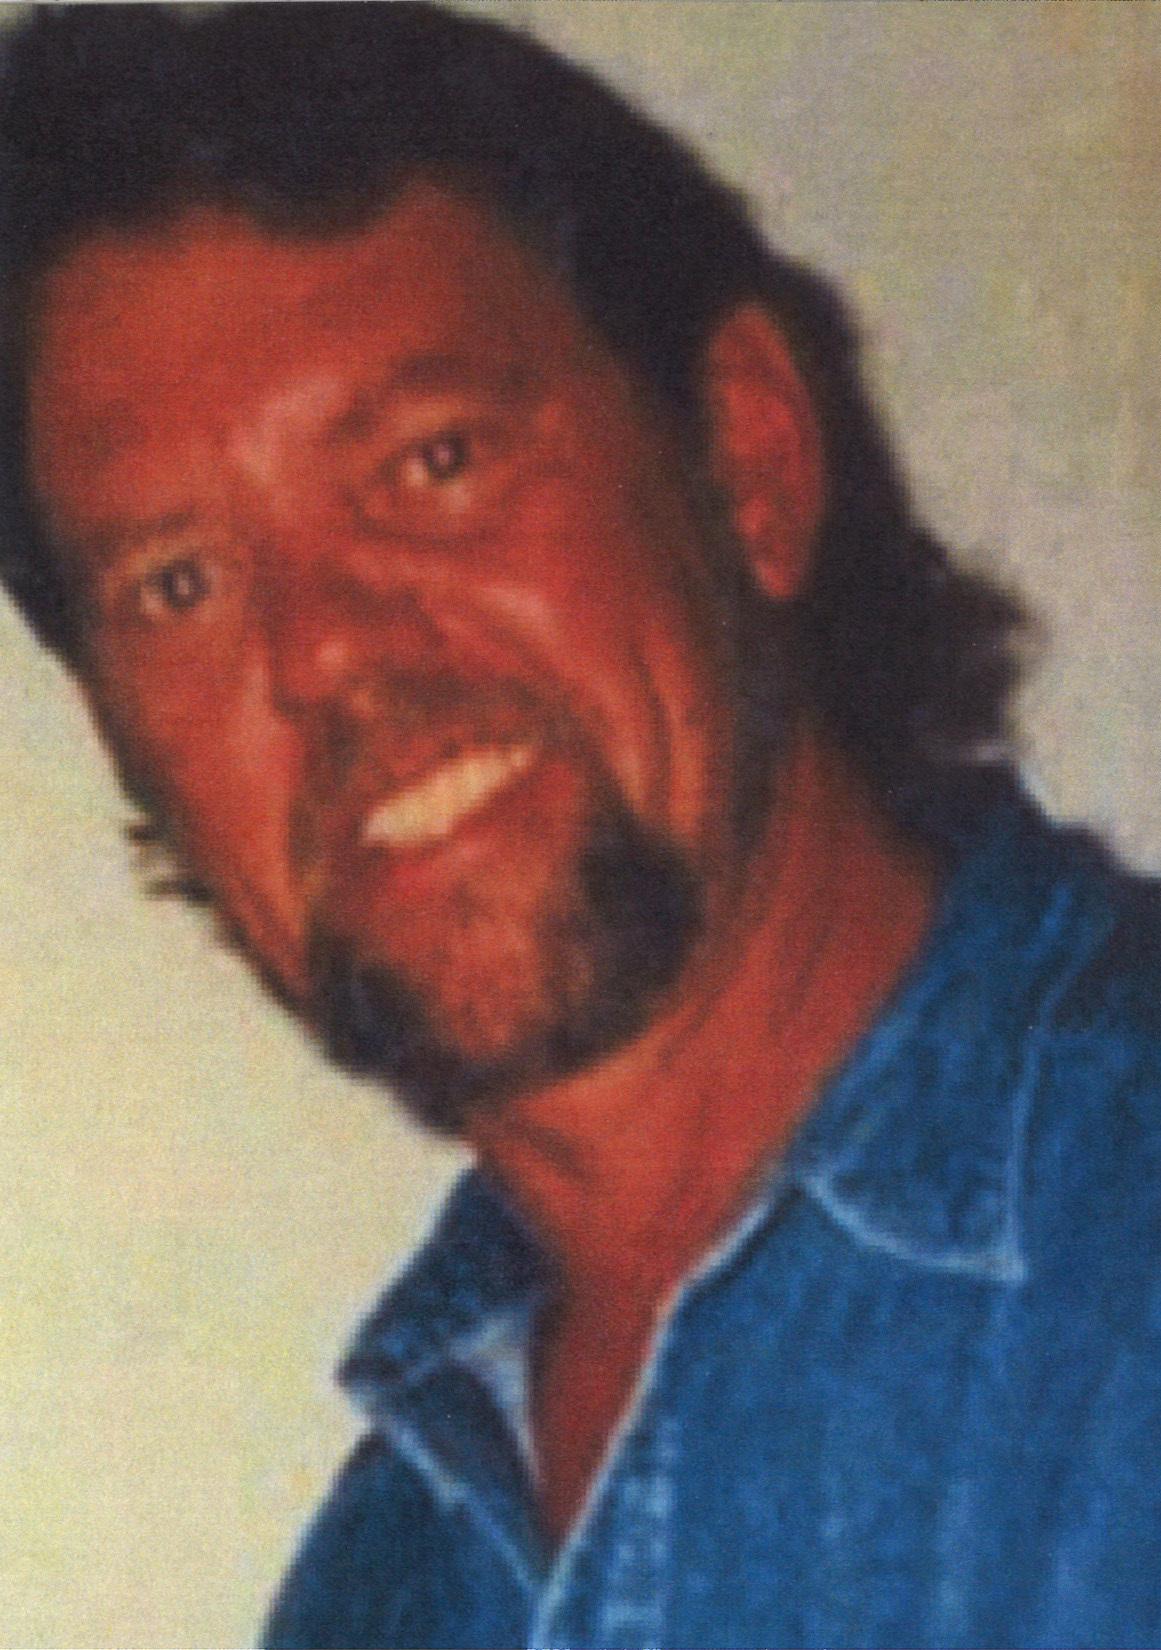 Roger David Schellhorn